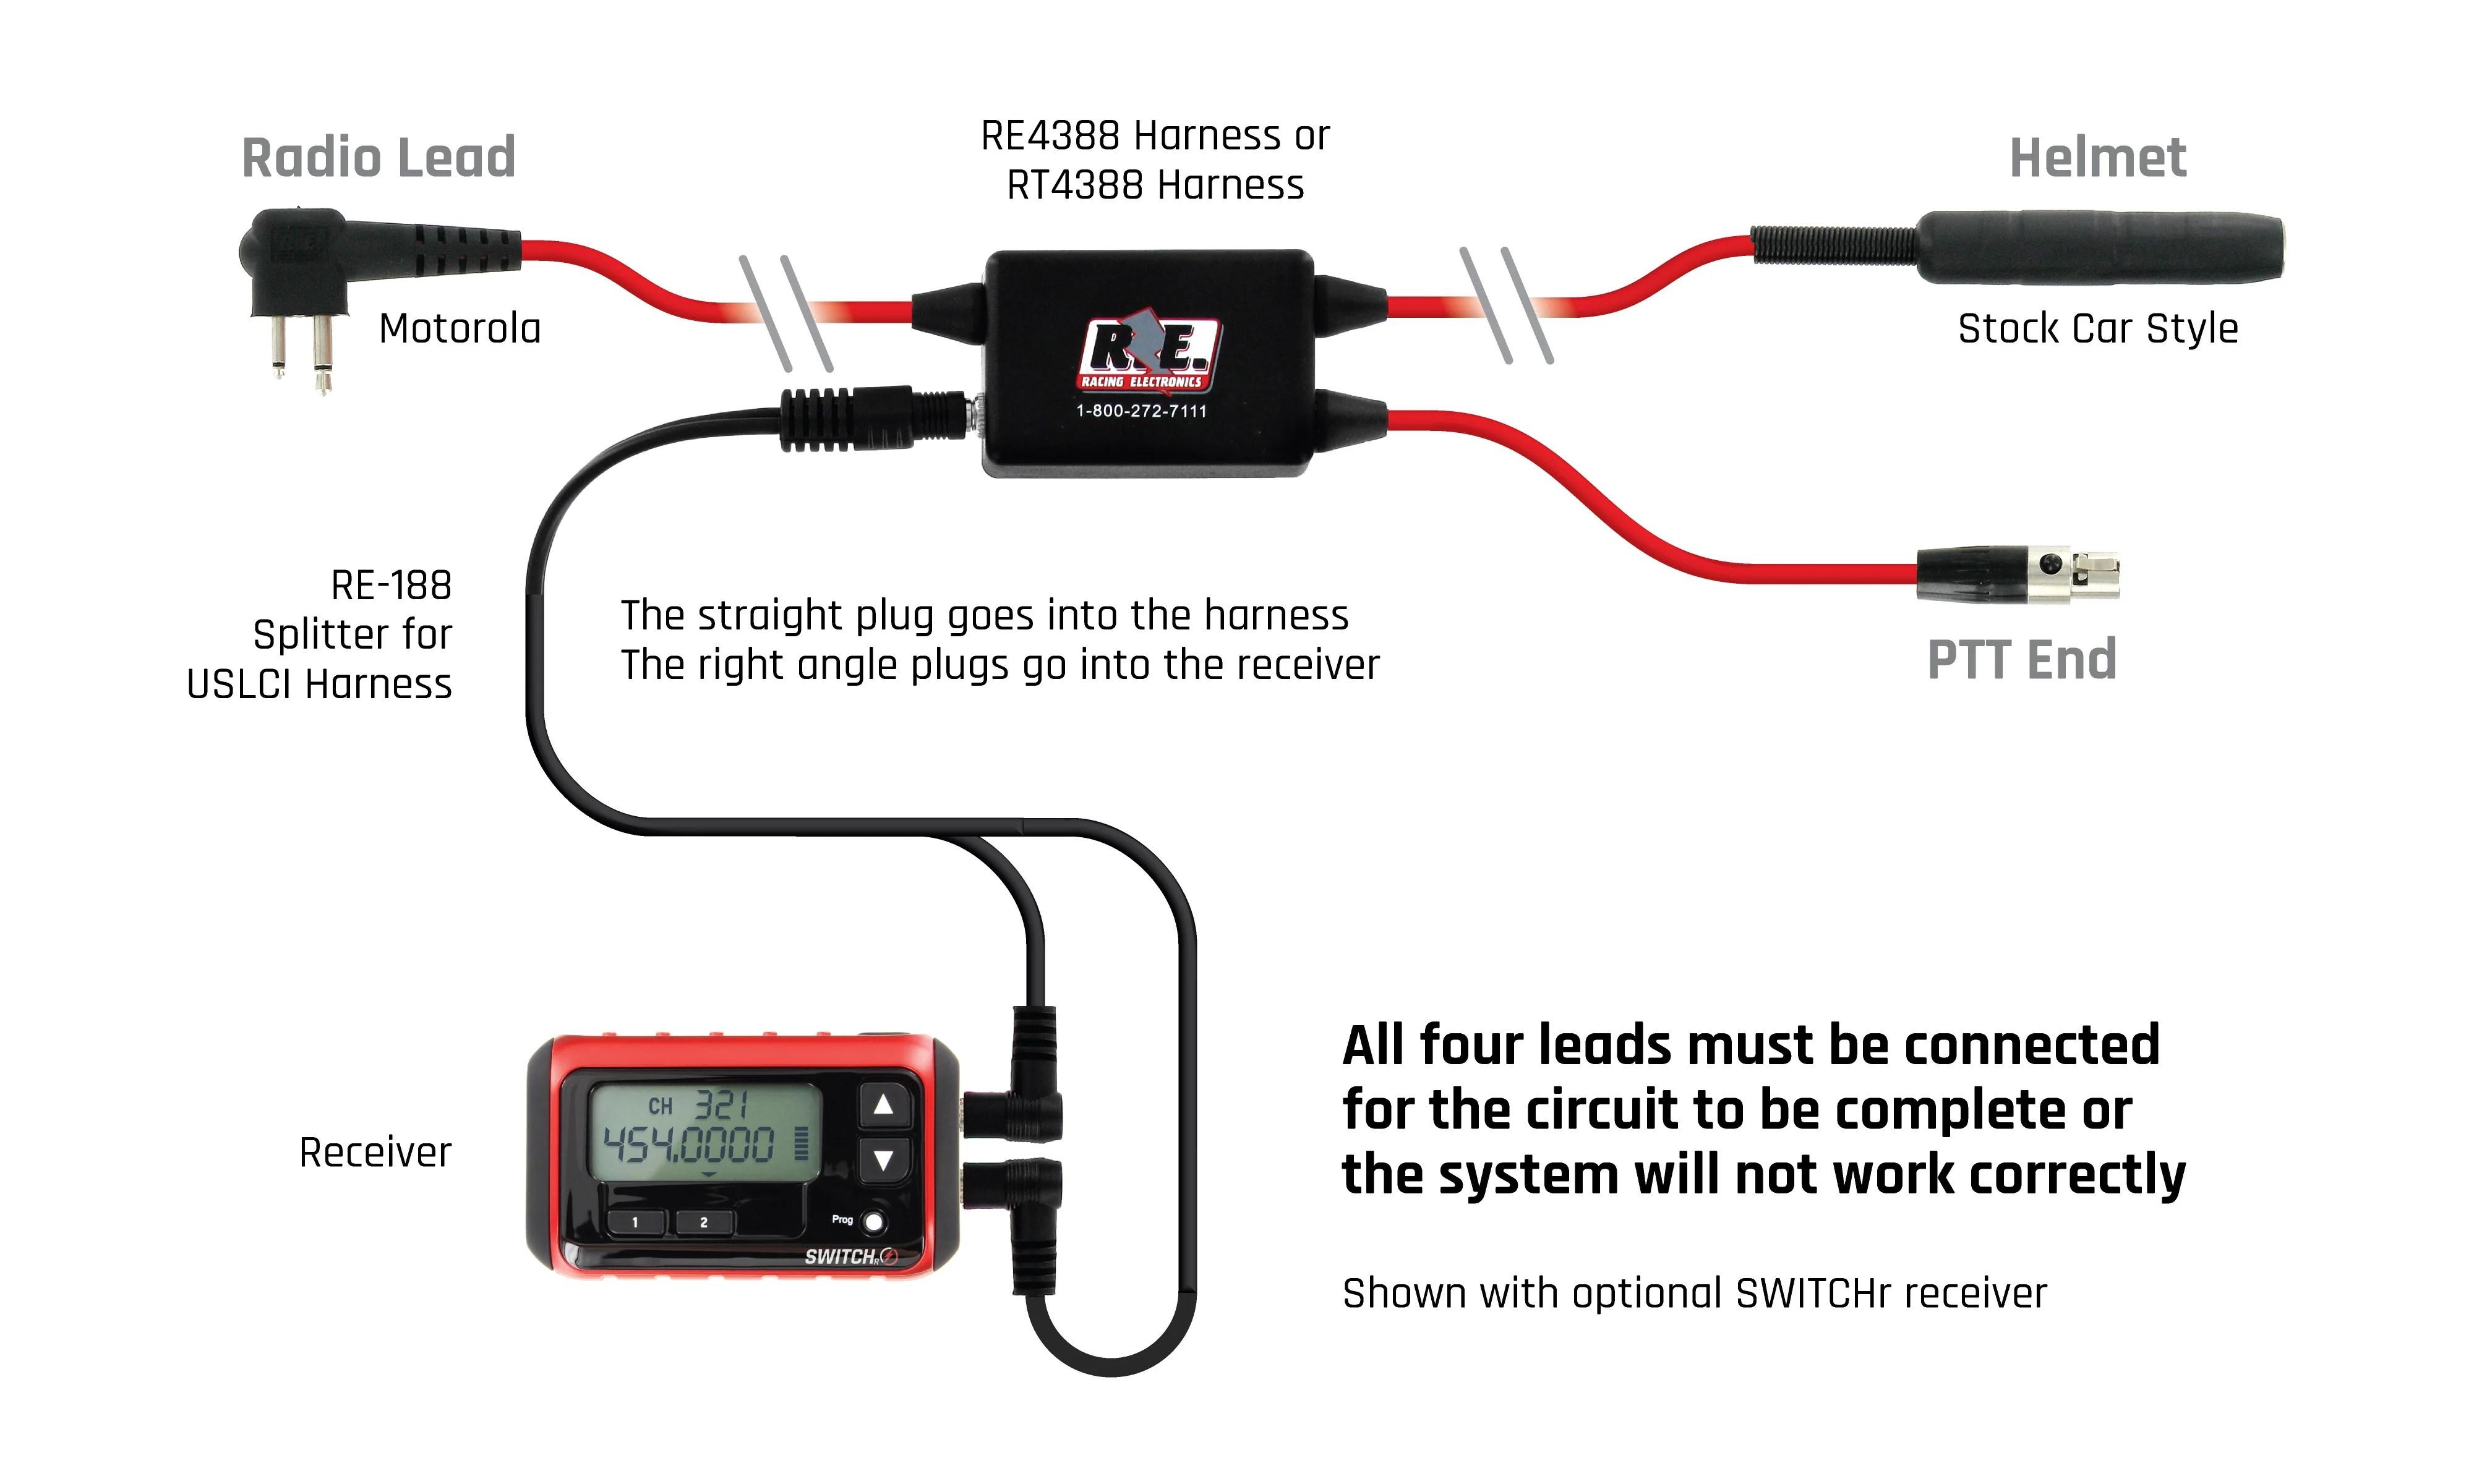 medium resolution of car harness 3 conductor racetrac 2 pin motorola uslci